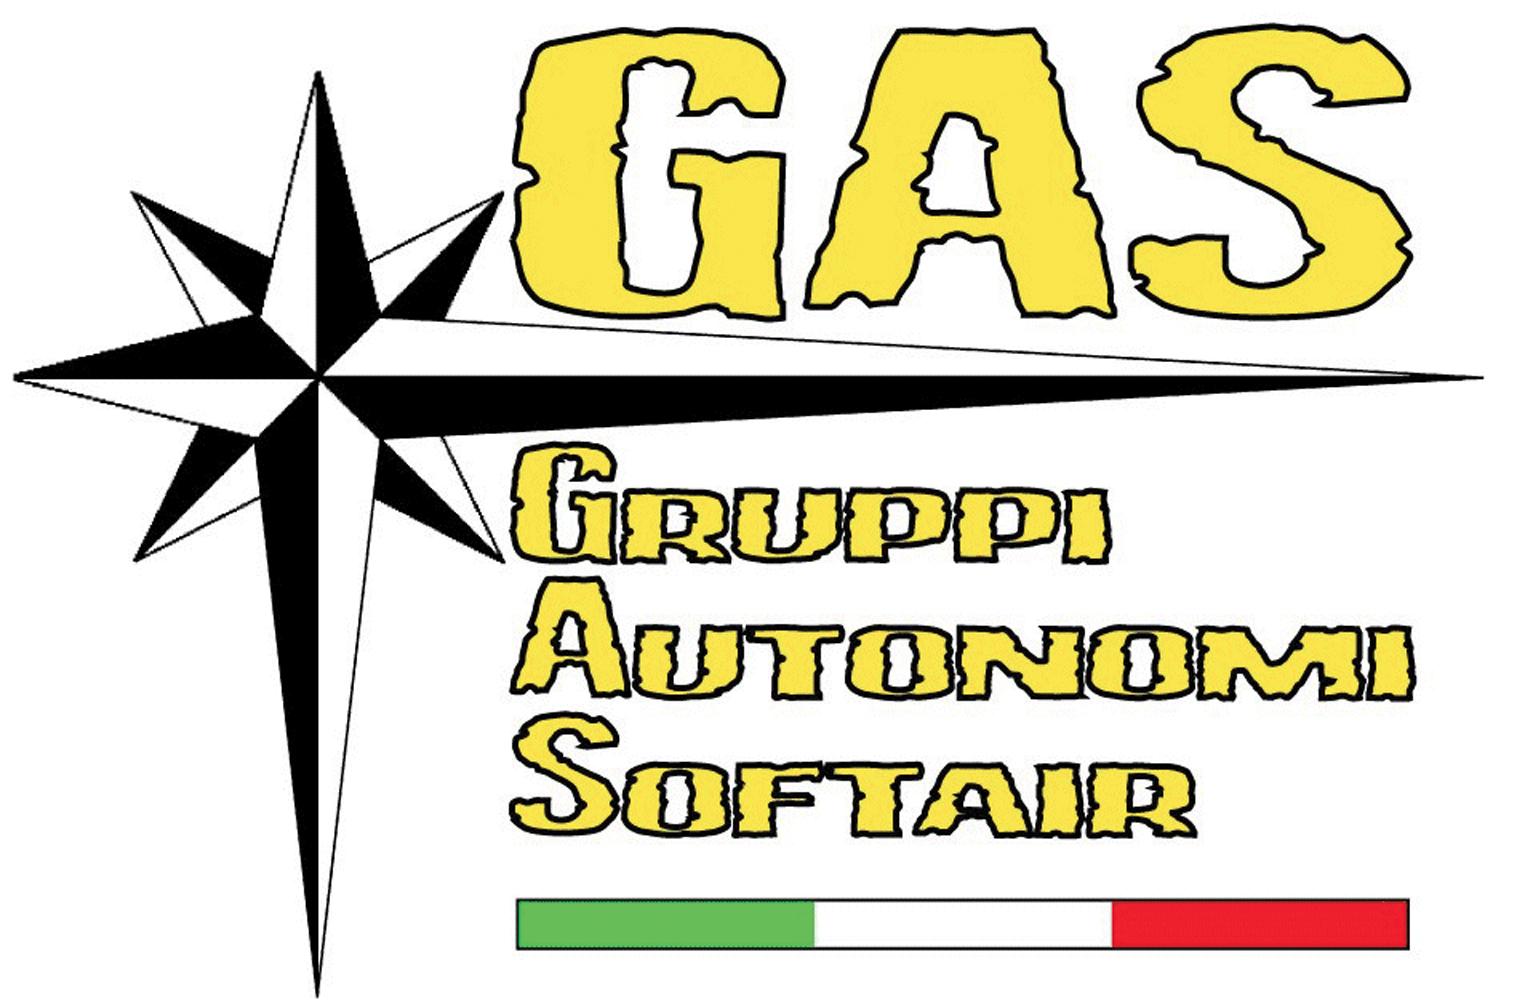 CNSF-logo-GAS